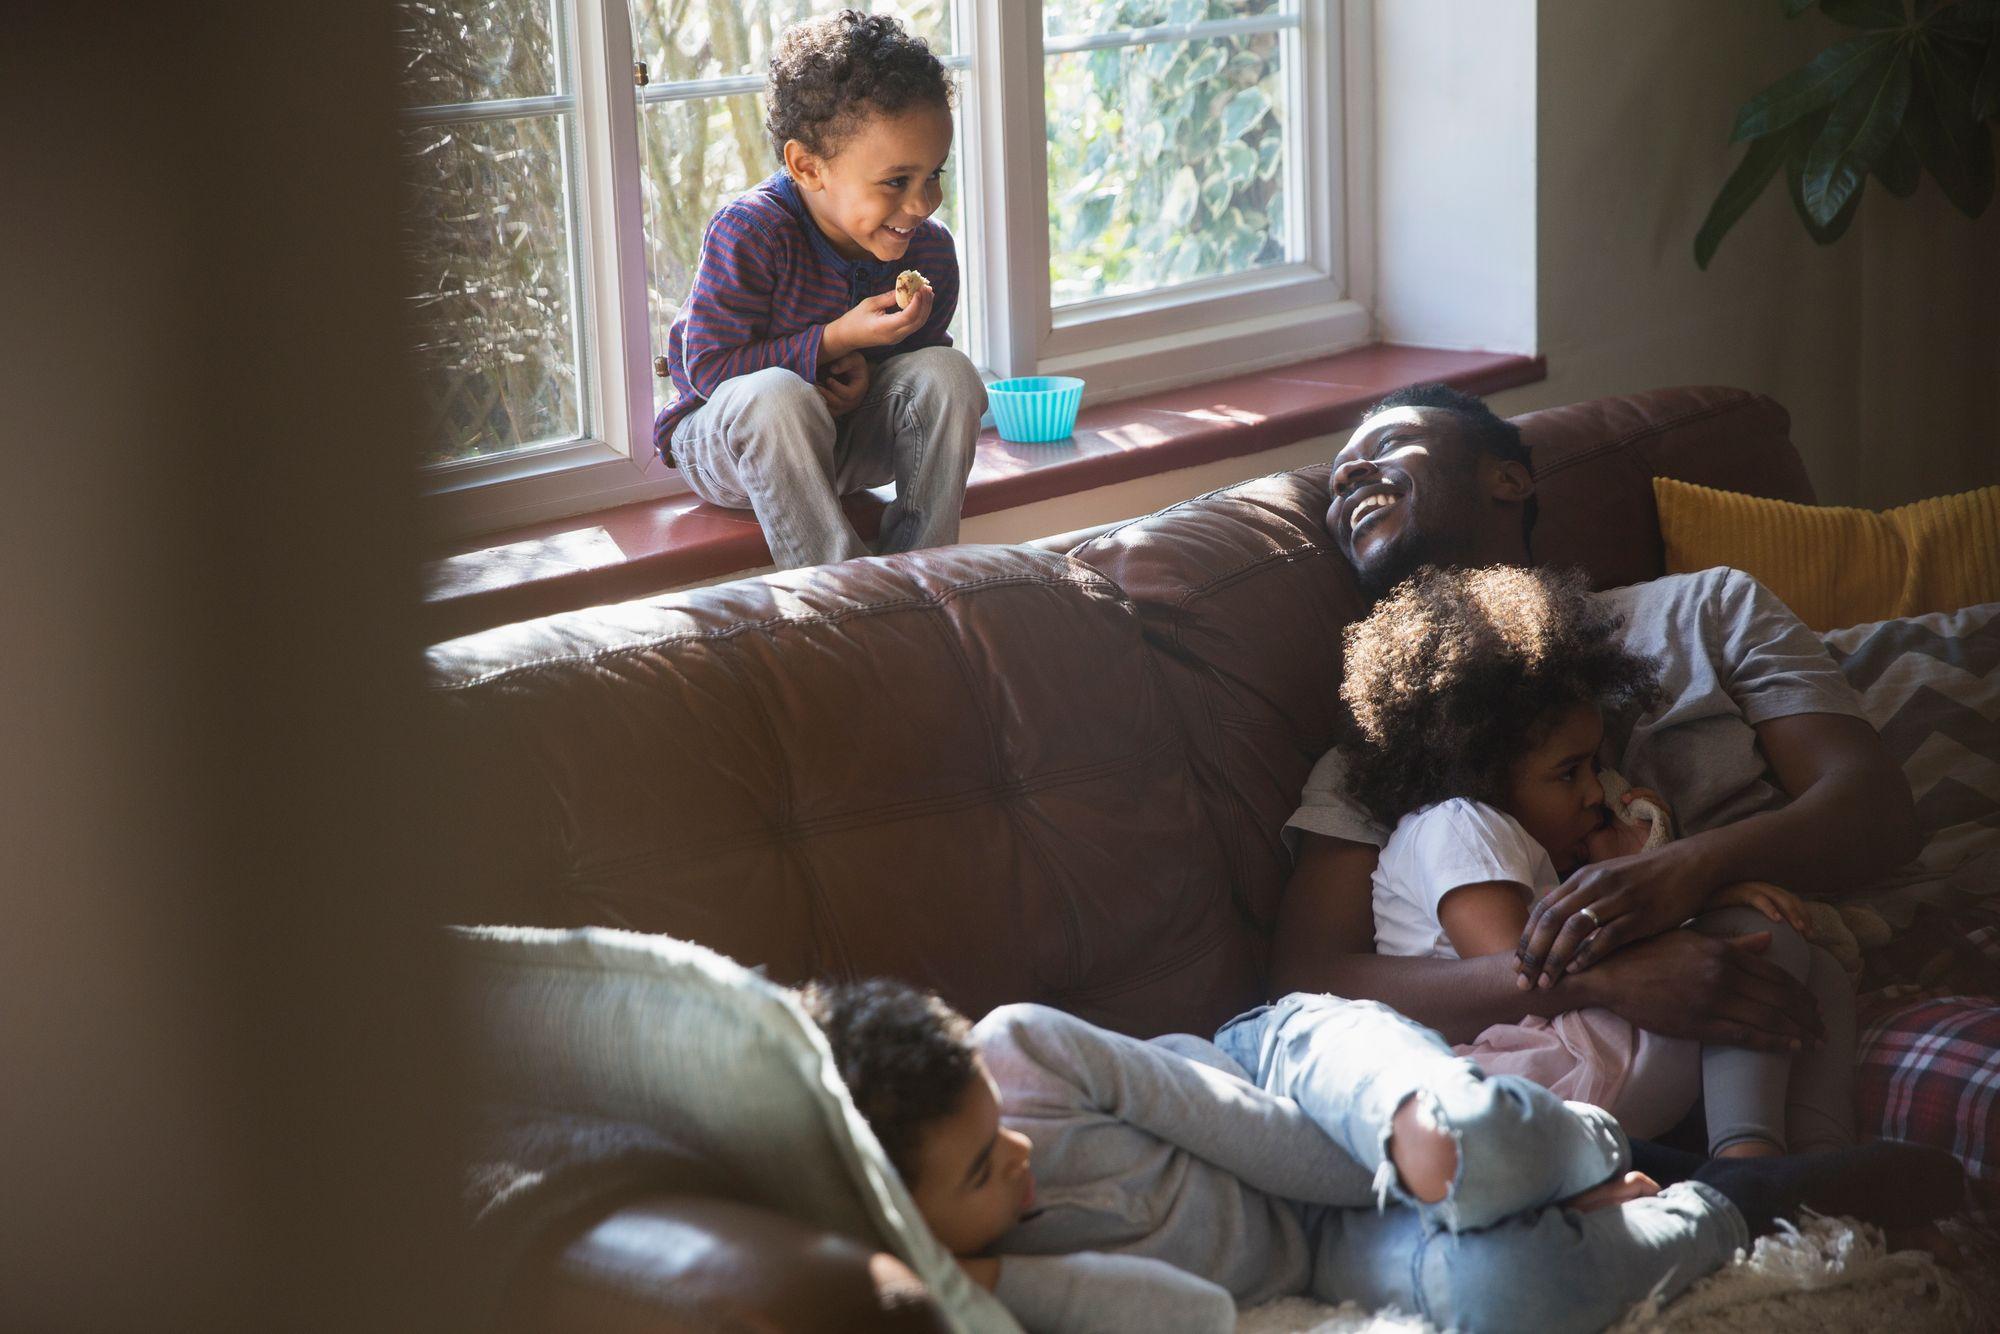 kids-travel-homeexchange-family-vacation